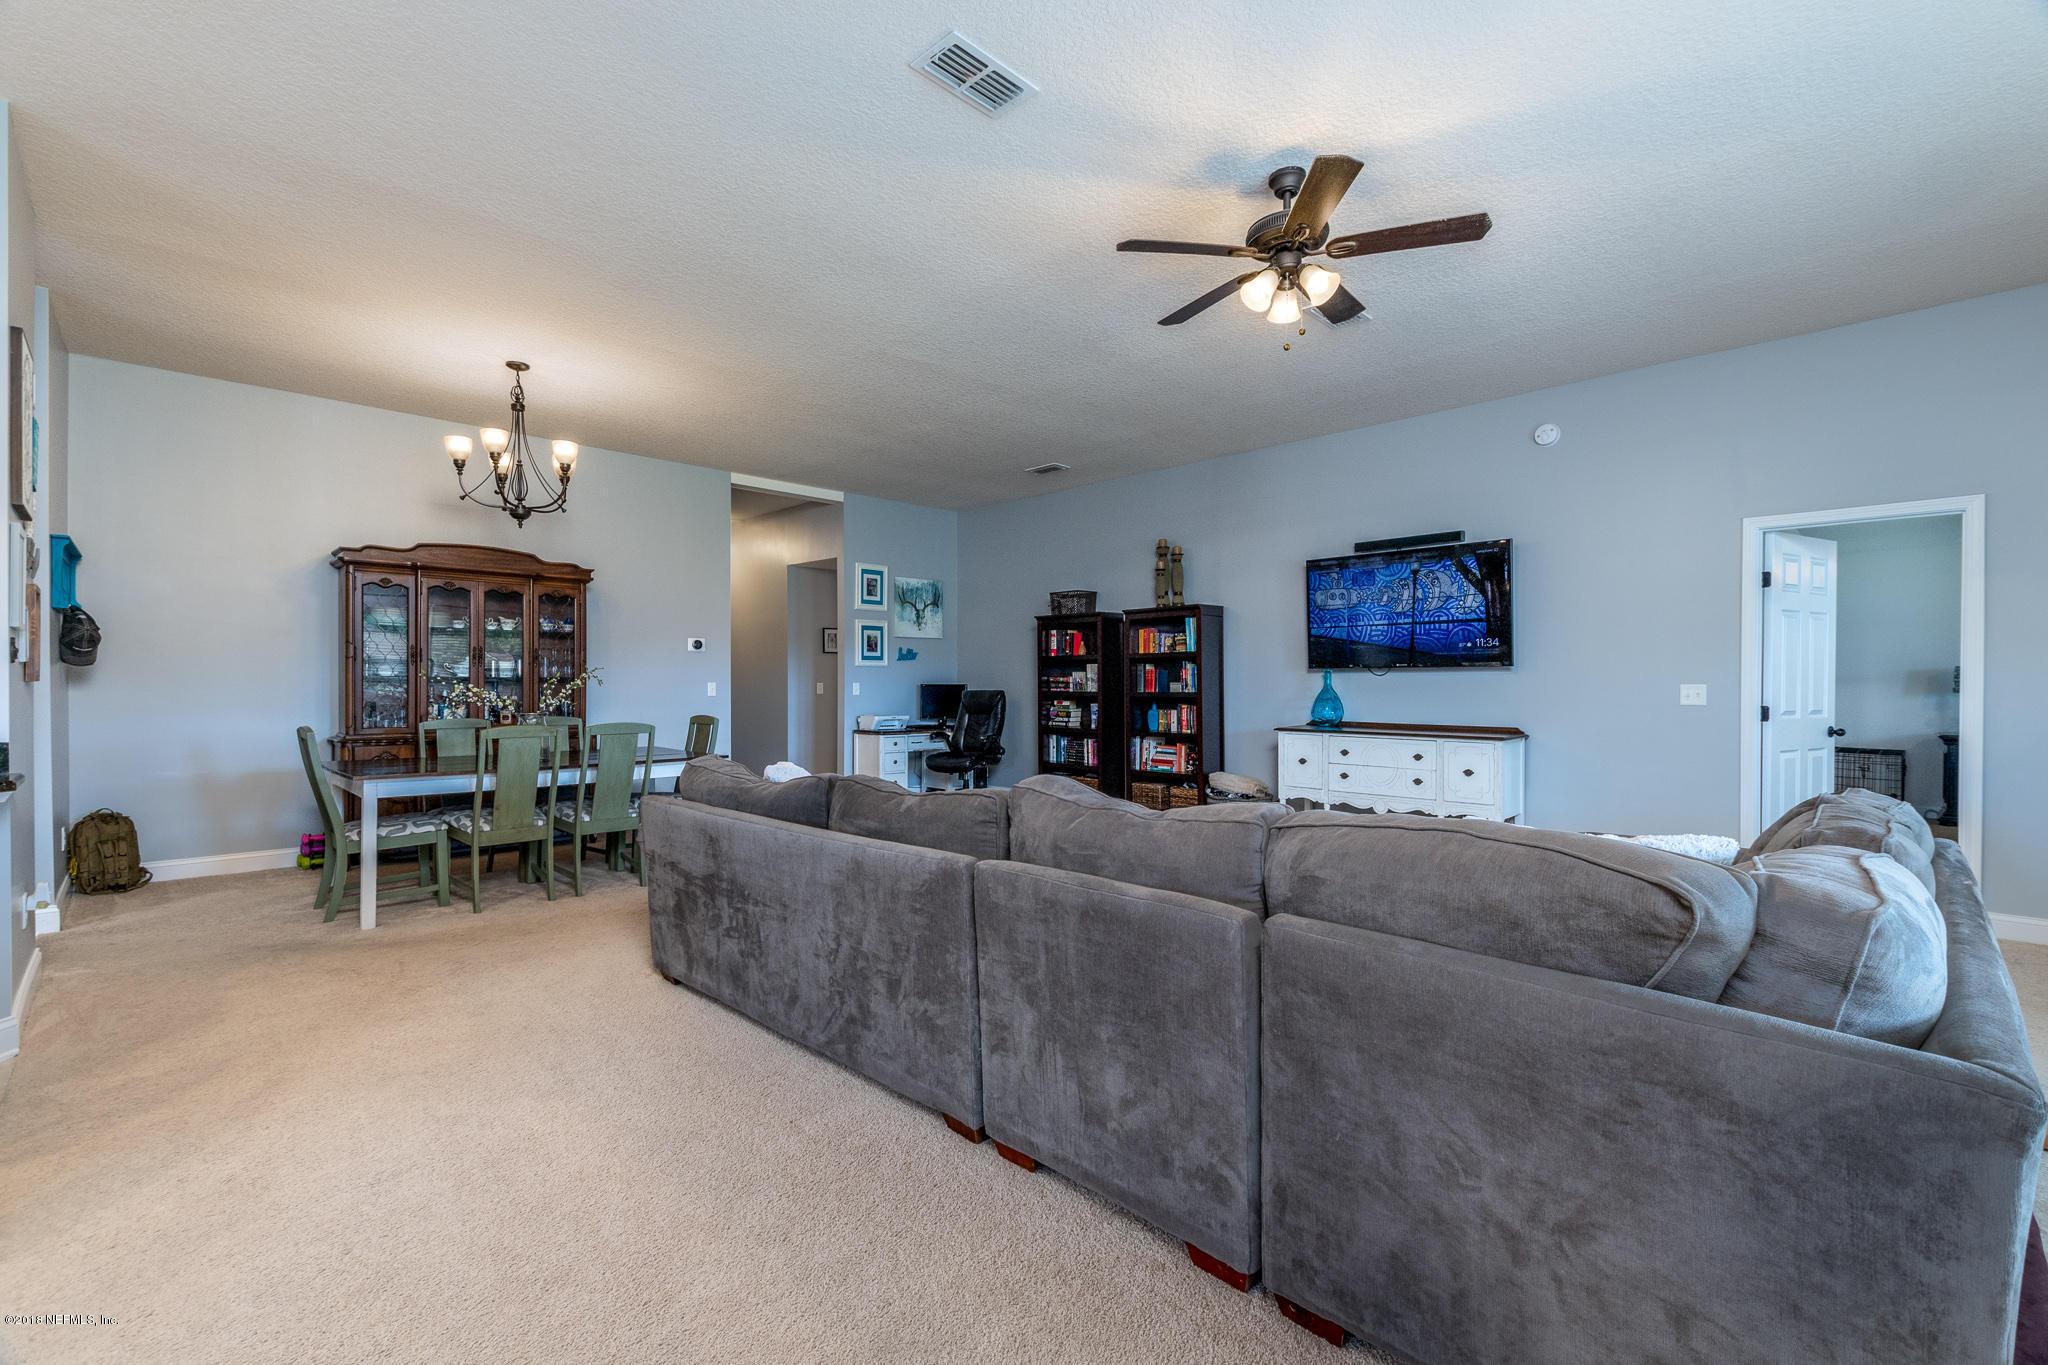 2955 VIANEY, GREEN COVE SPRINGS, FLORIDA 32043, 5 Bedrooms Bedrooms, ,3 BathroomsBathrooms,Residential - single family,For sale,VIANEY,944950